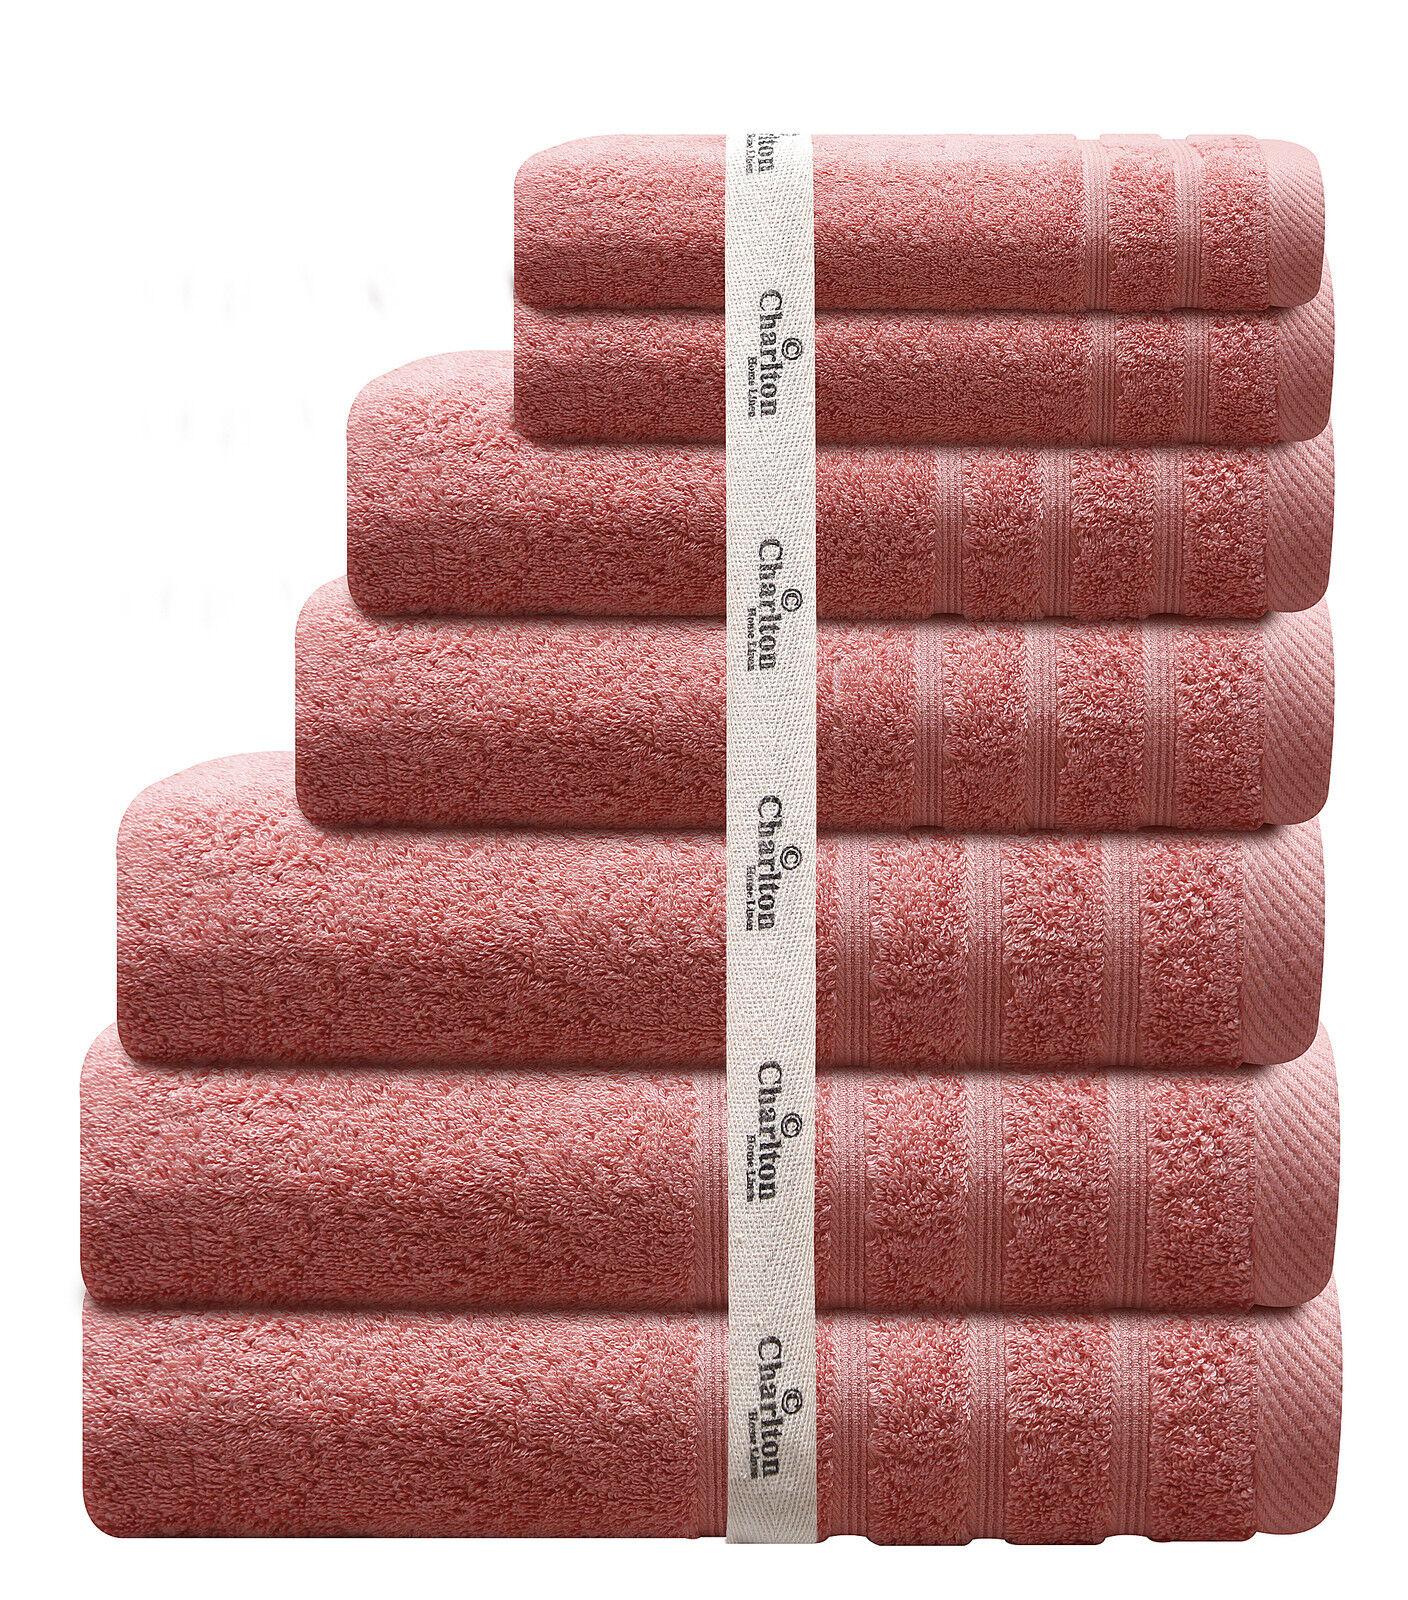 7pce 575gsm Egyptian Cotton Towel Set 2